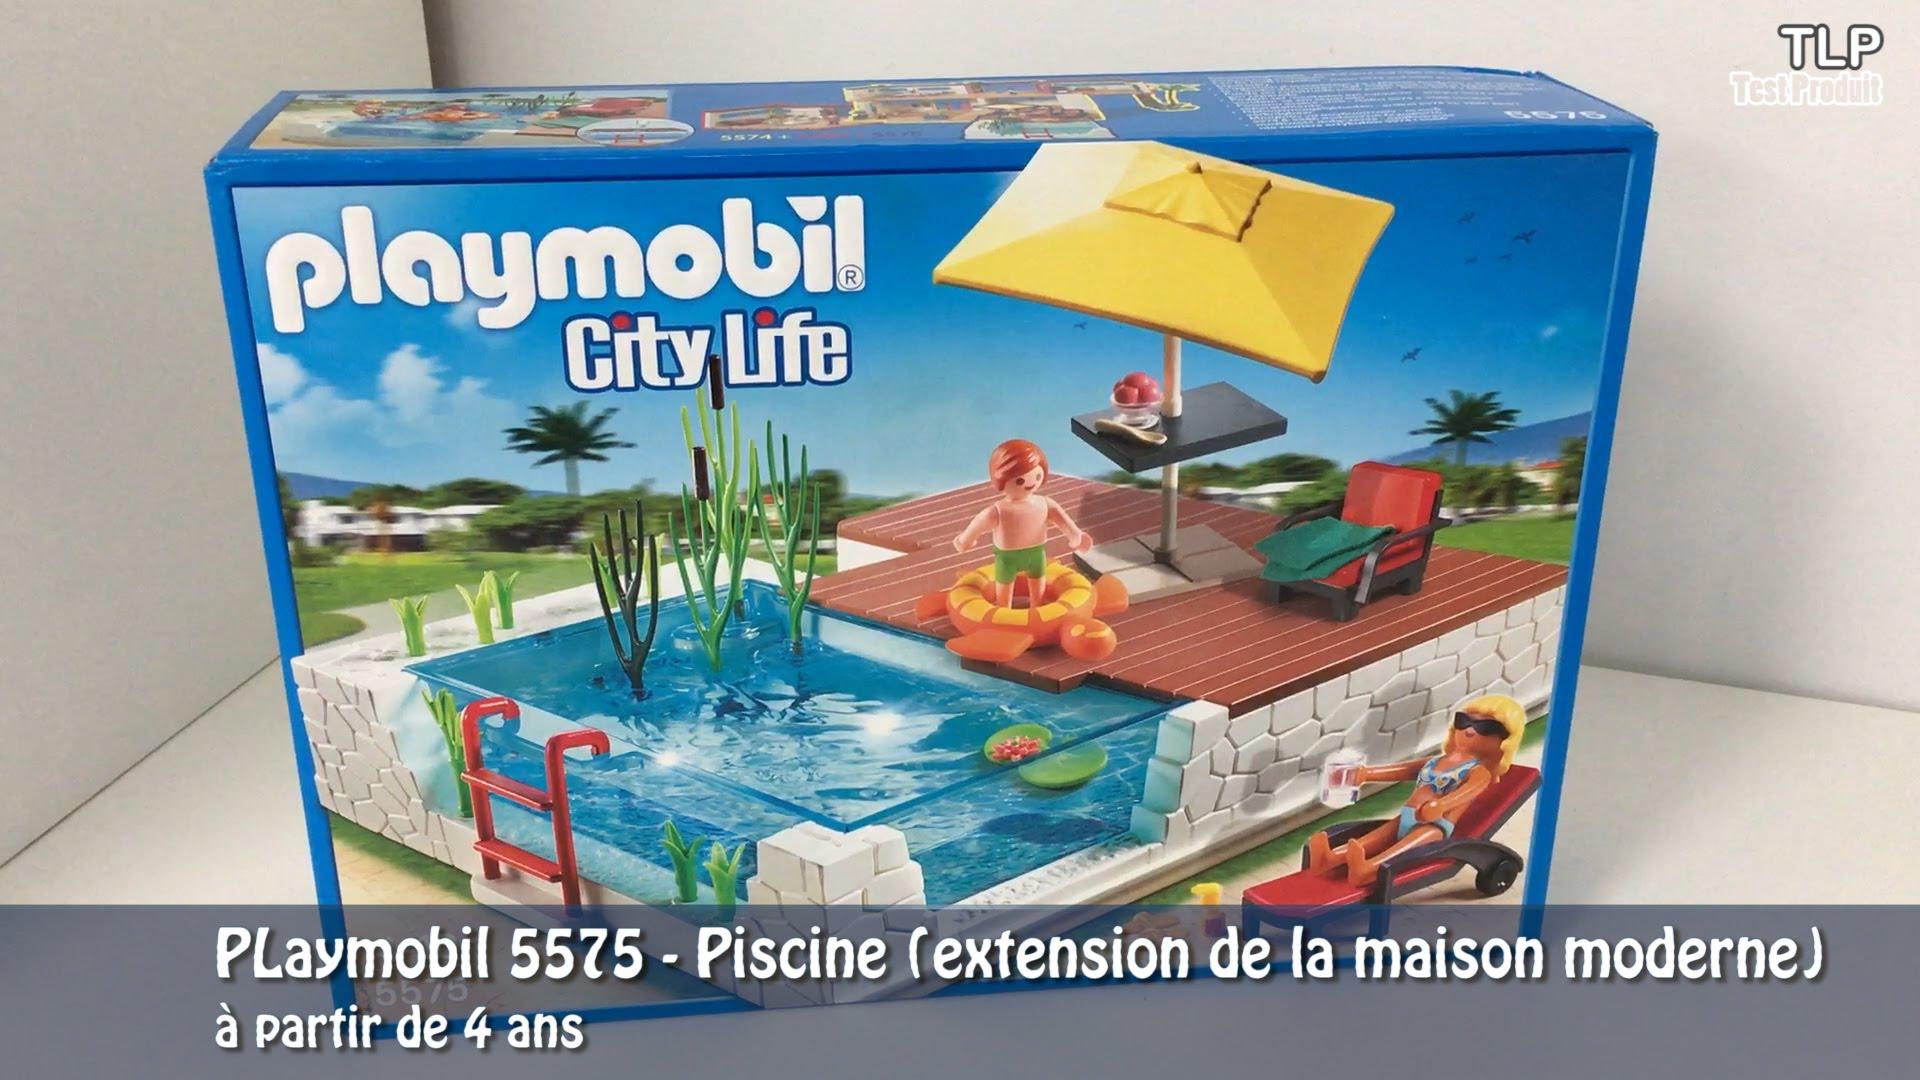 Playmobil youtube maison - zagafrica.fr